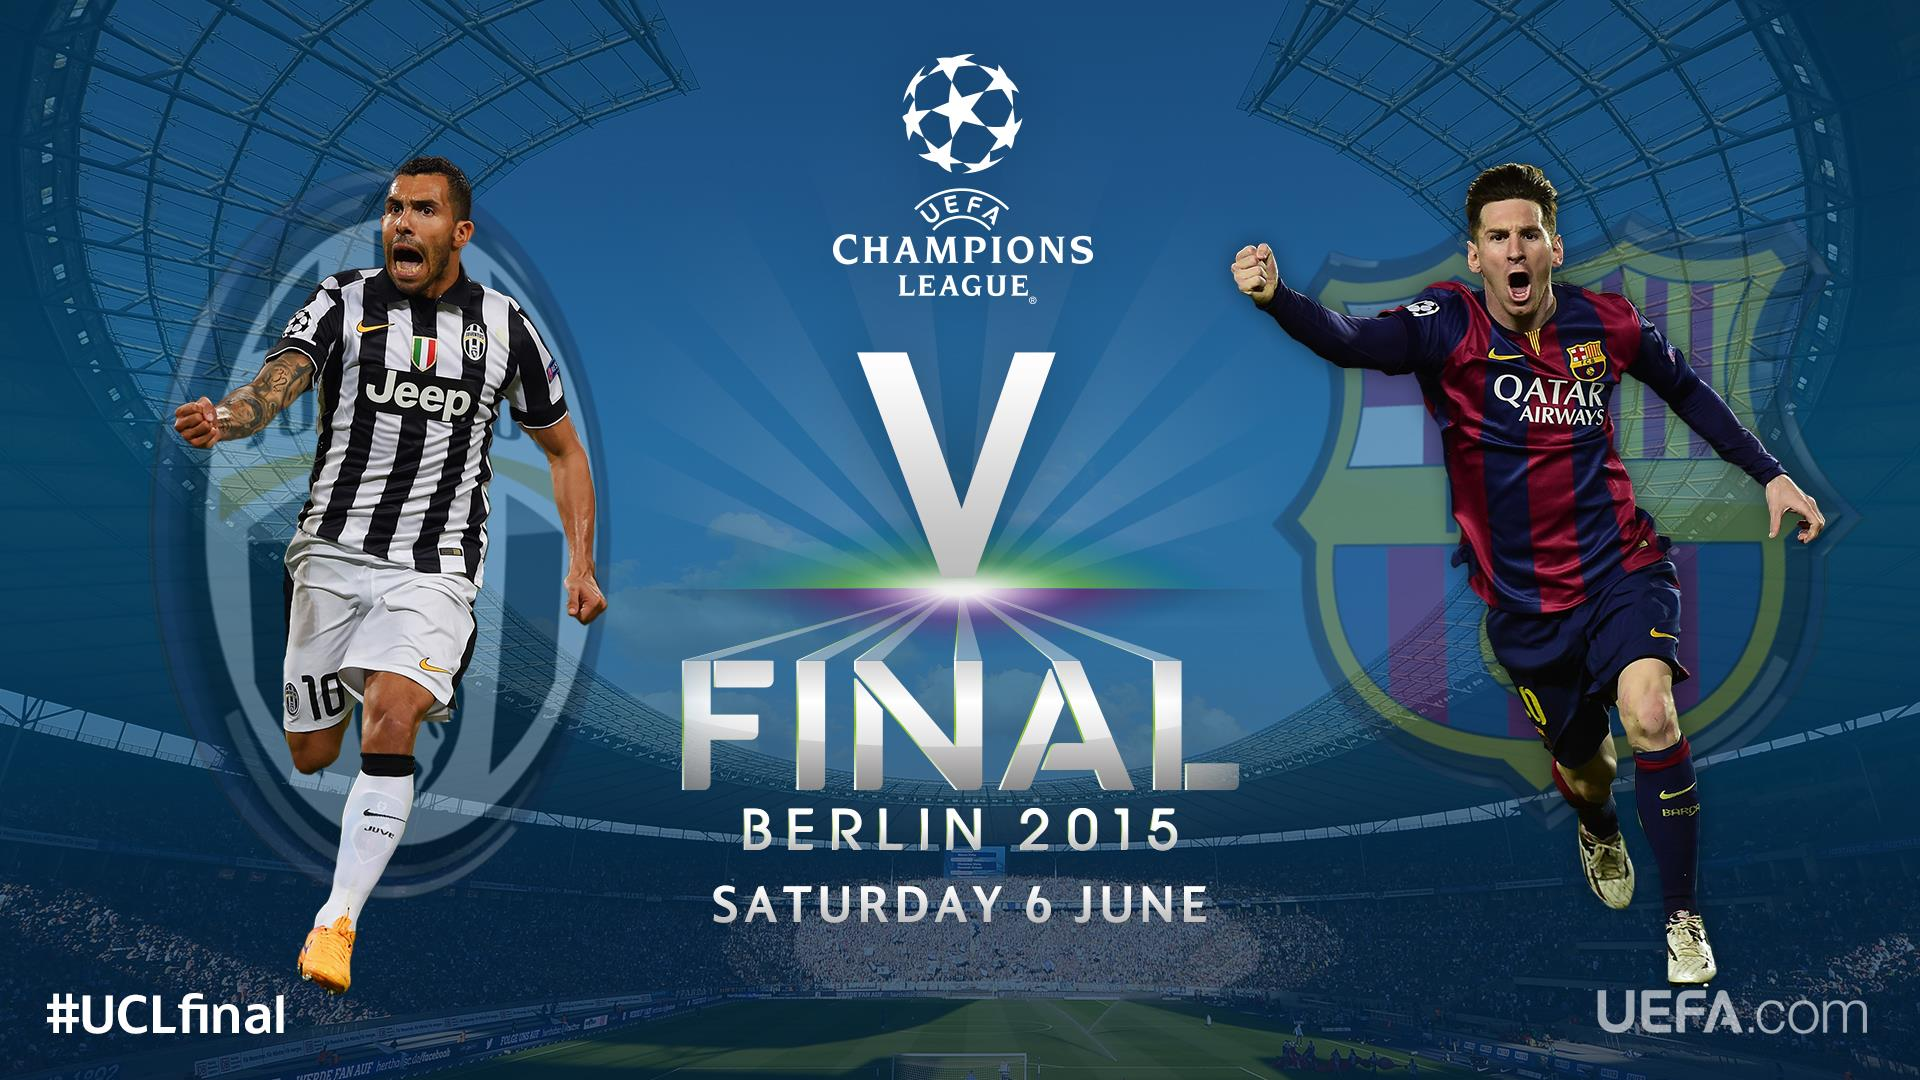 Final da Champions